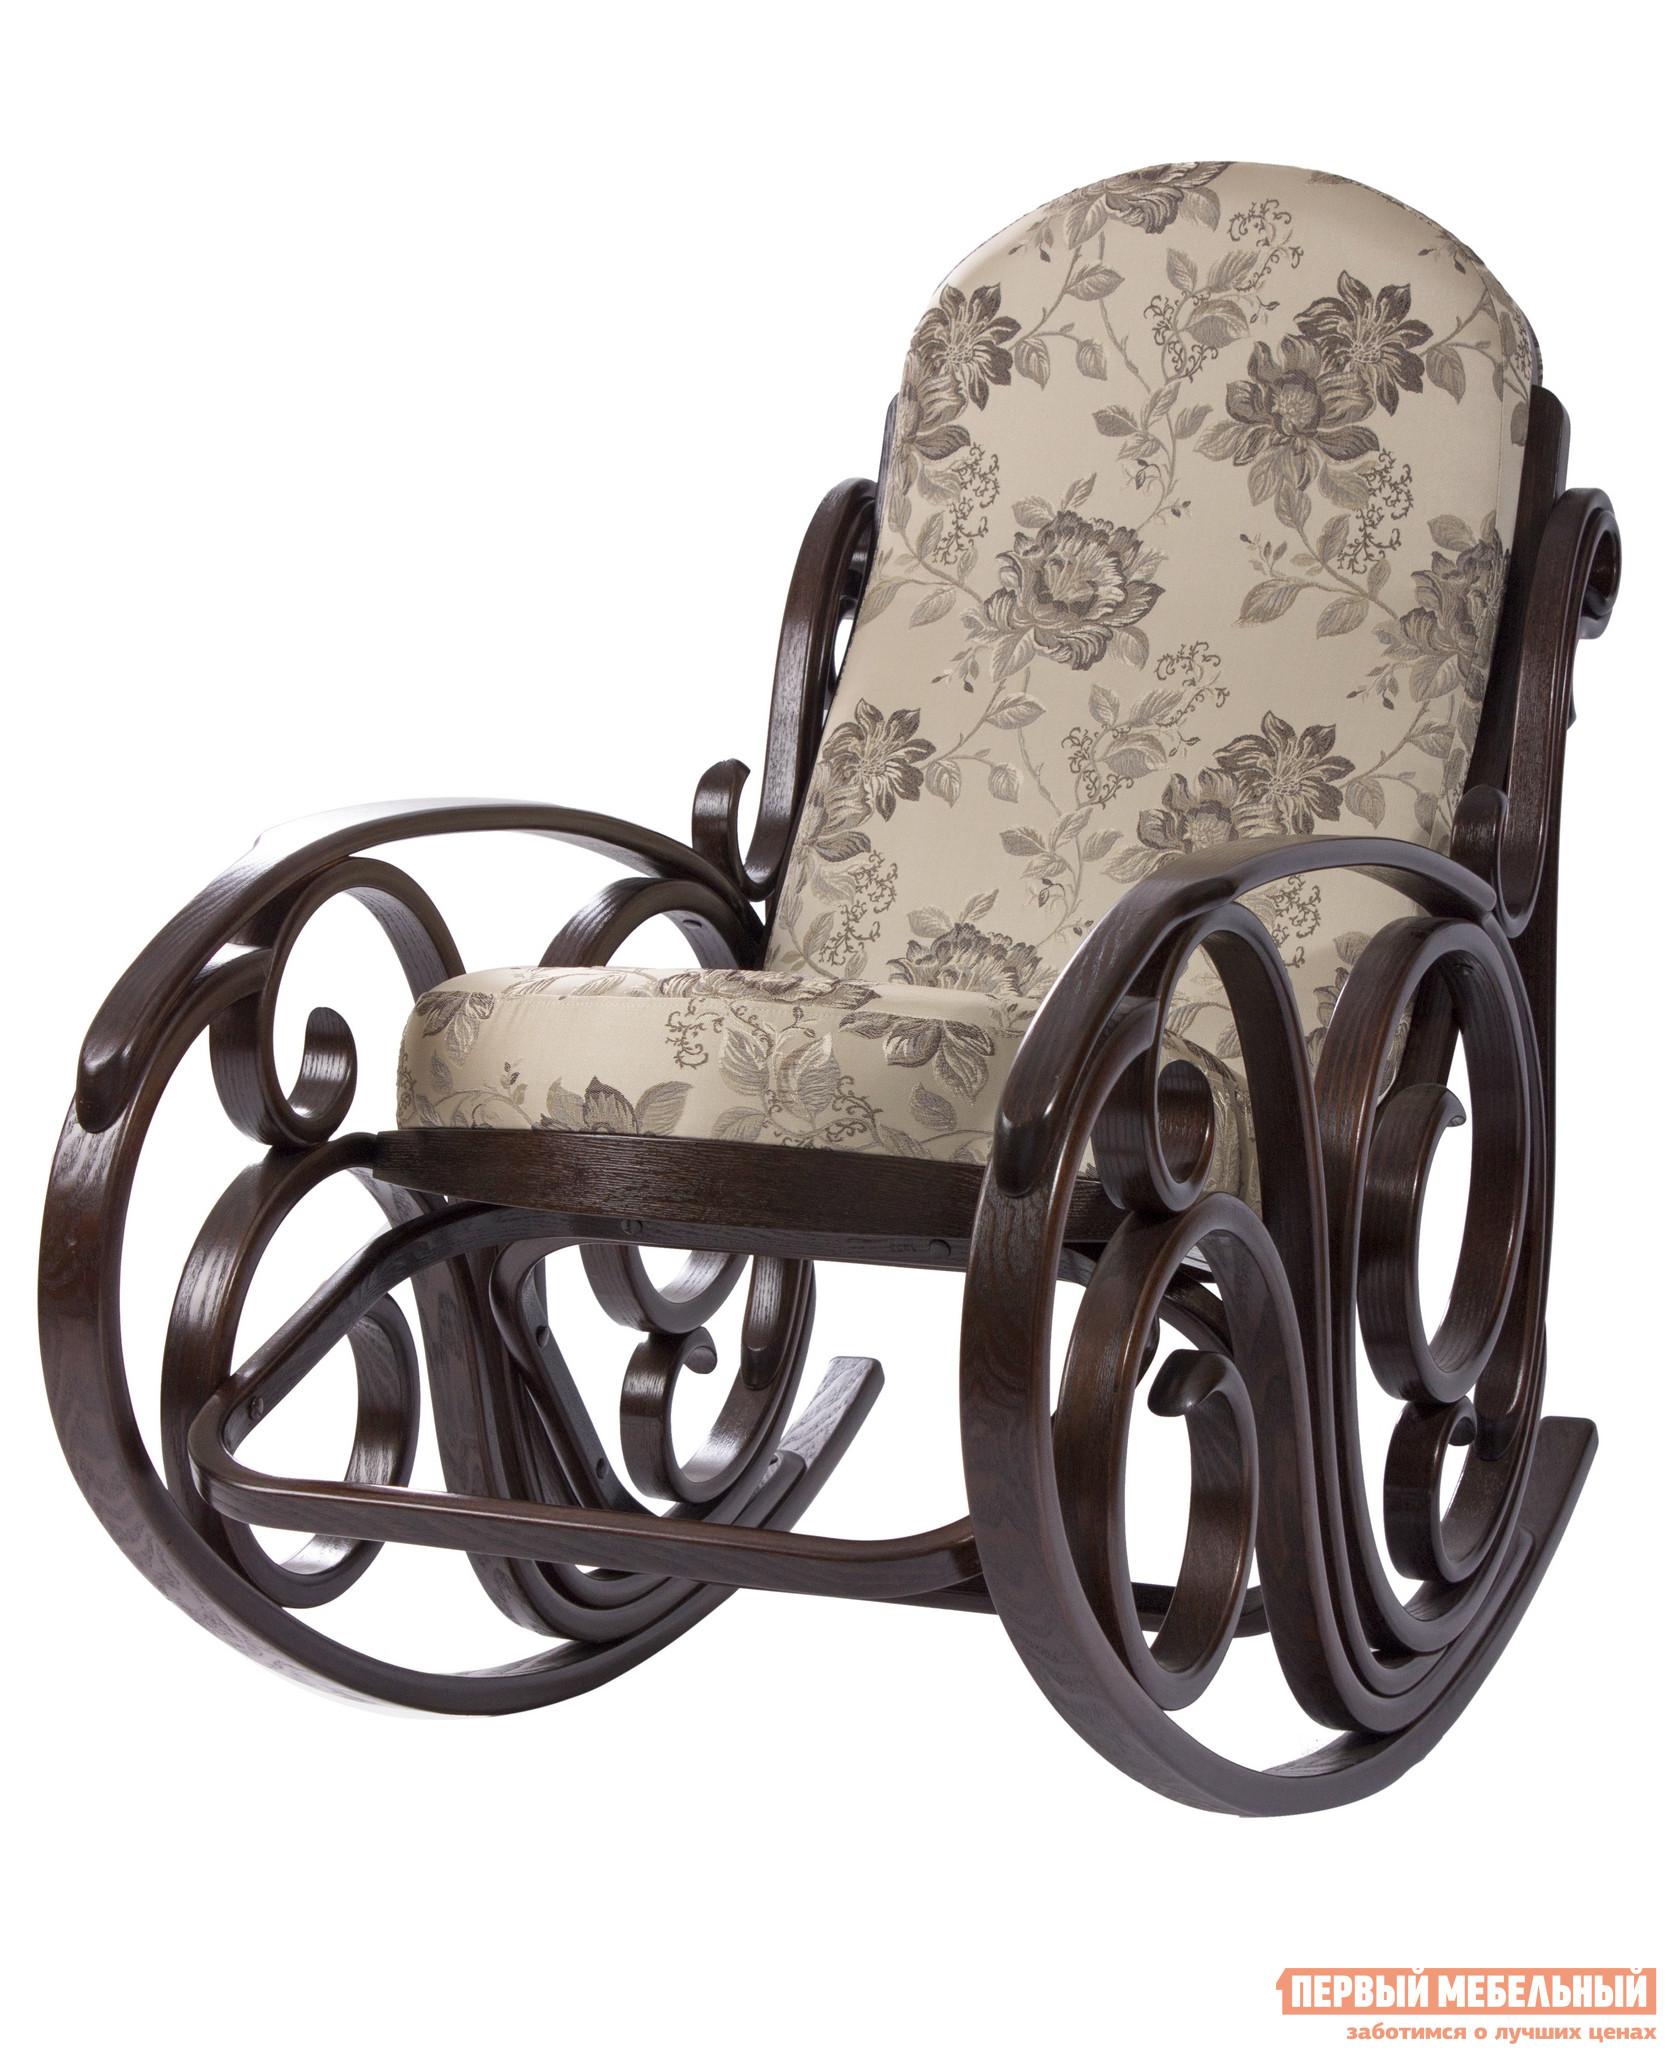 Кресло-качалка Мебель Импэкс Кресло-качалка Венеция кресло качалка дизайнерское jimi